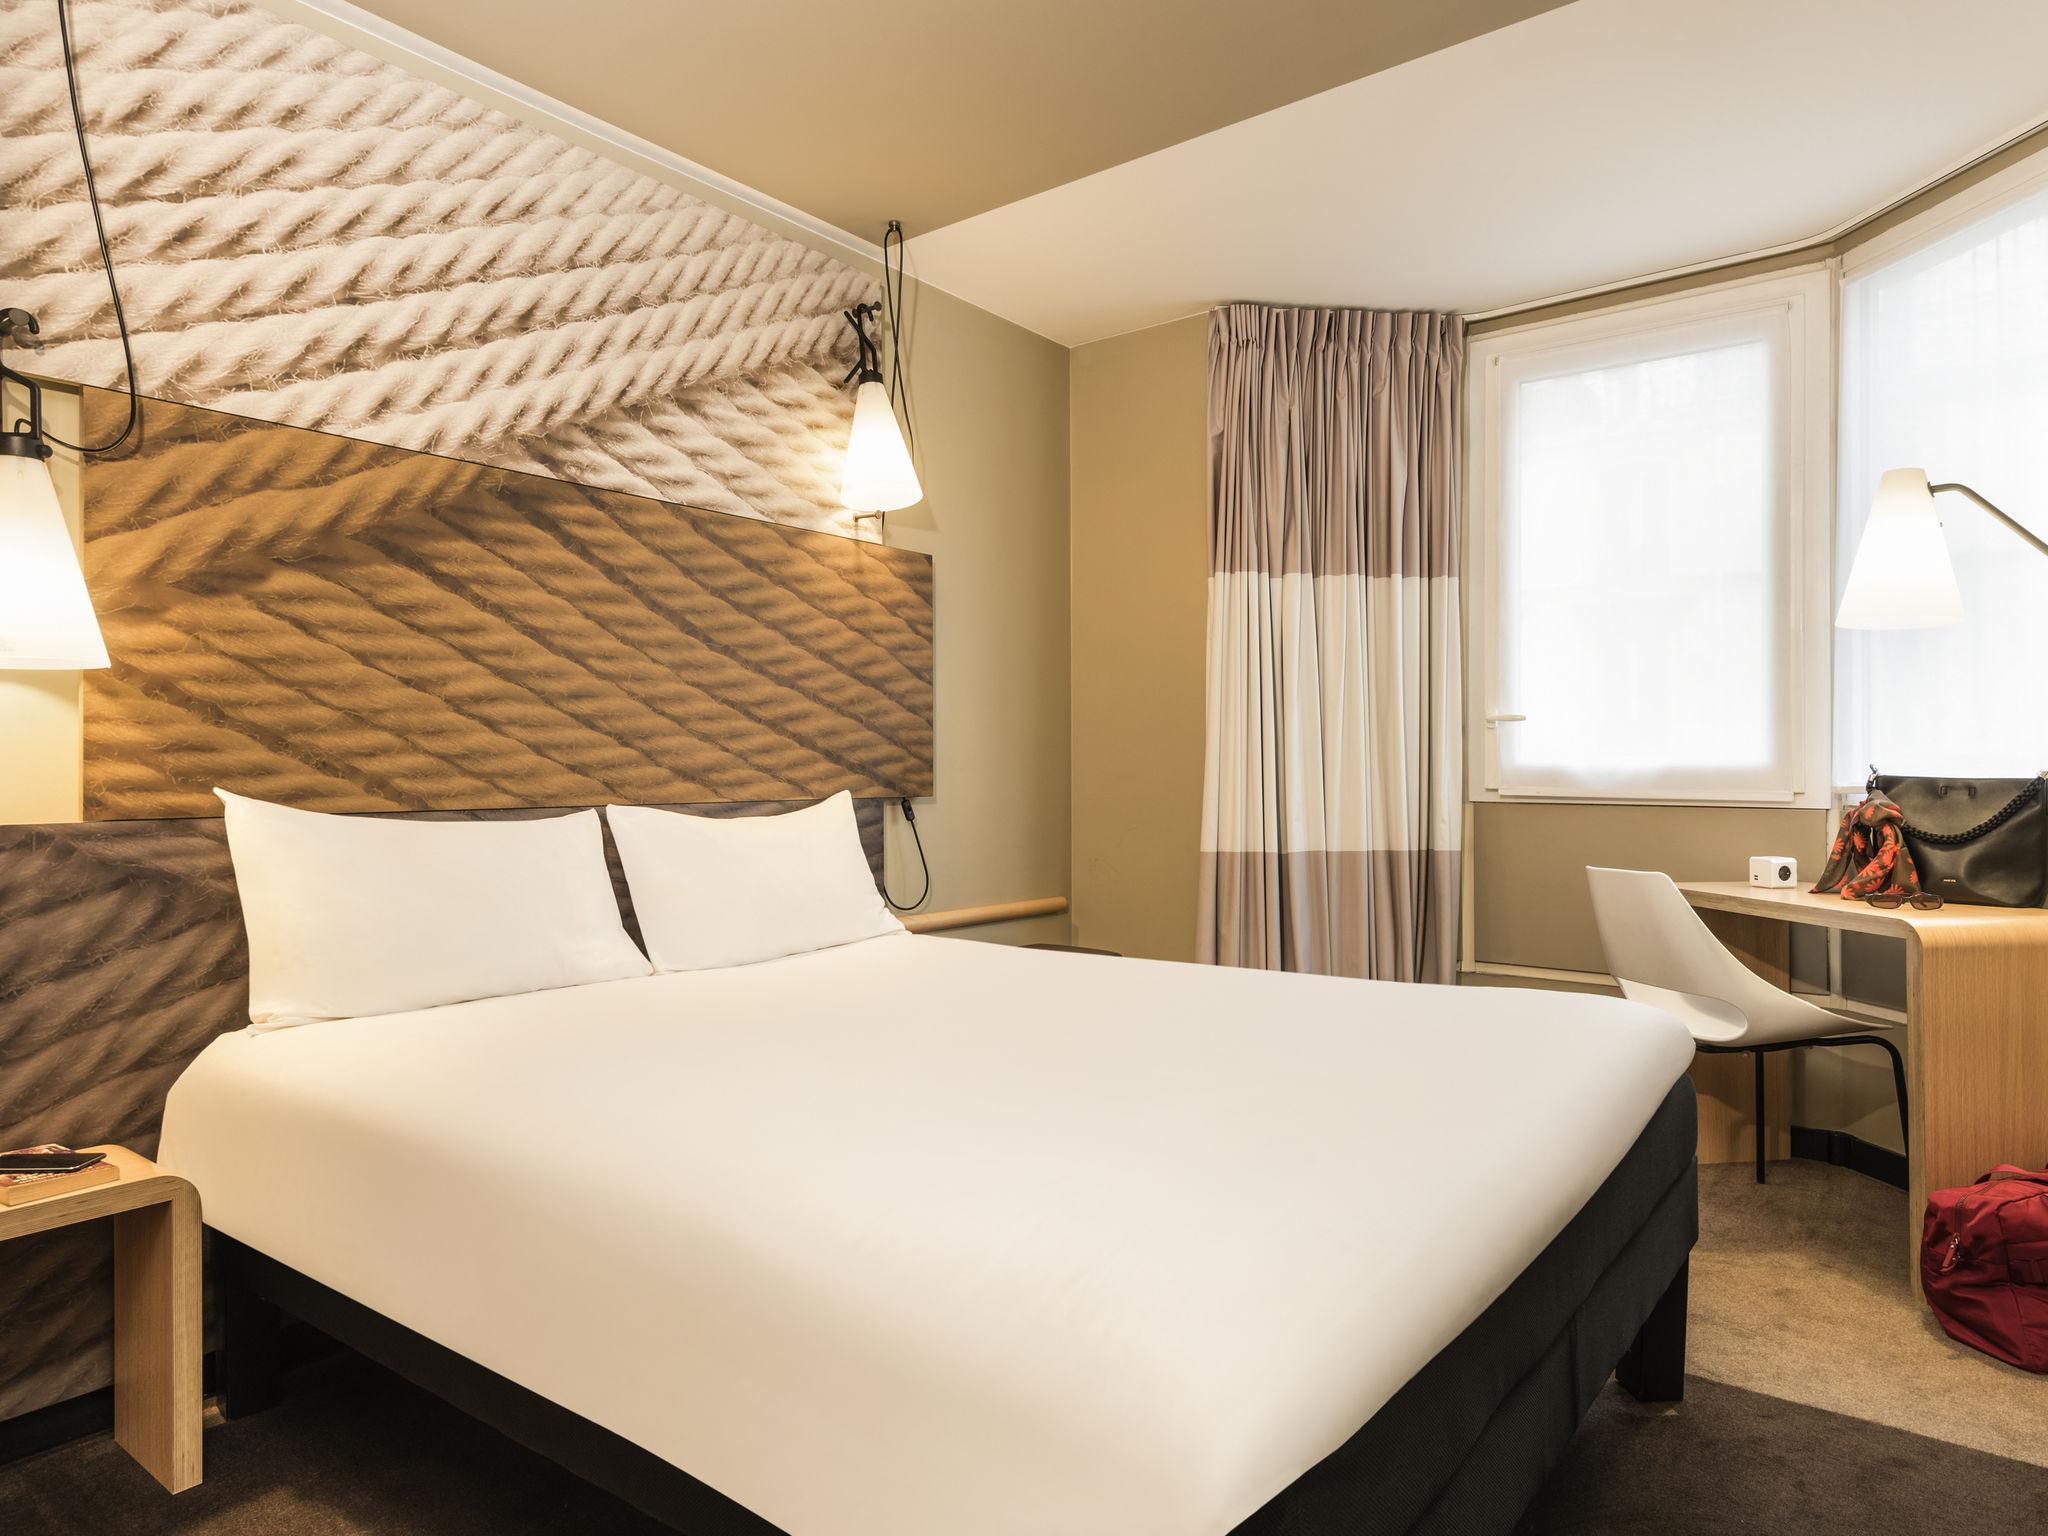 Hotel - ibis Paris Gare du Nord Chateau Landon 10th